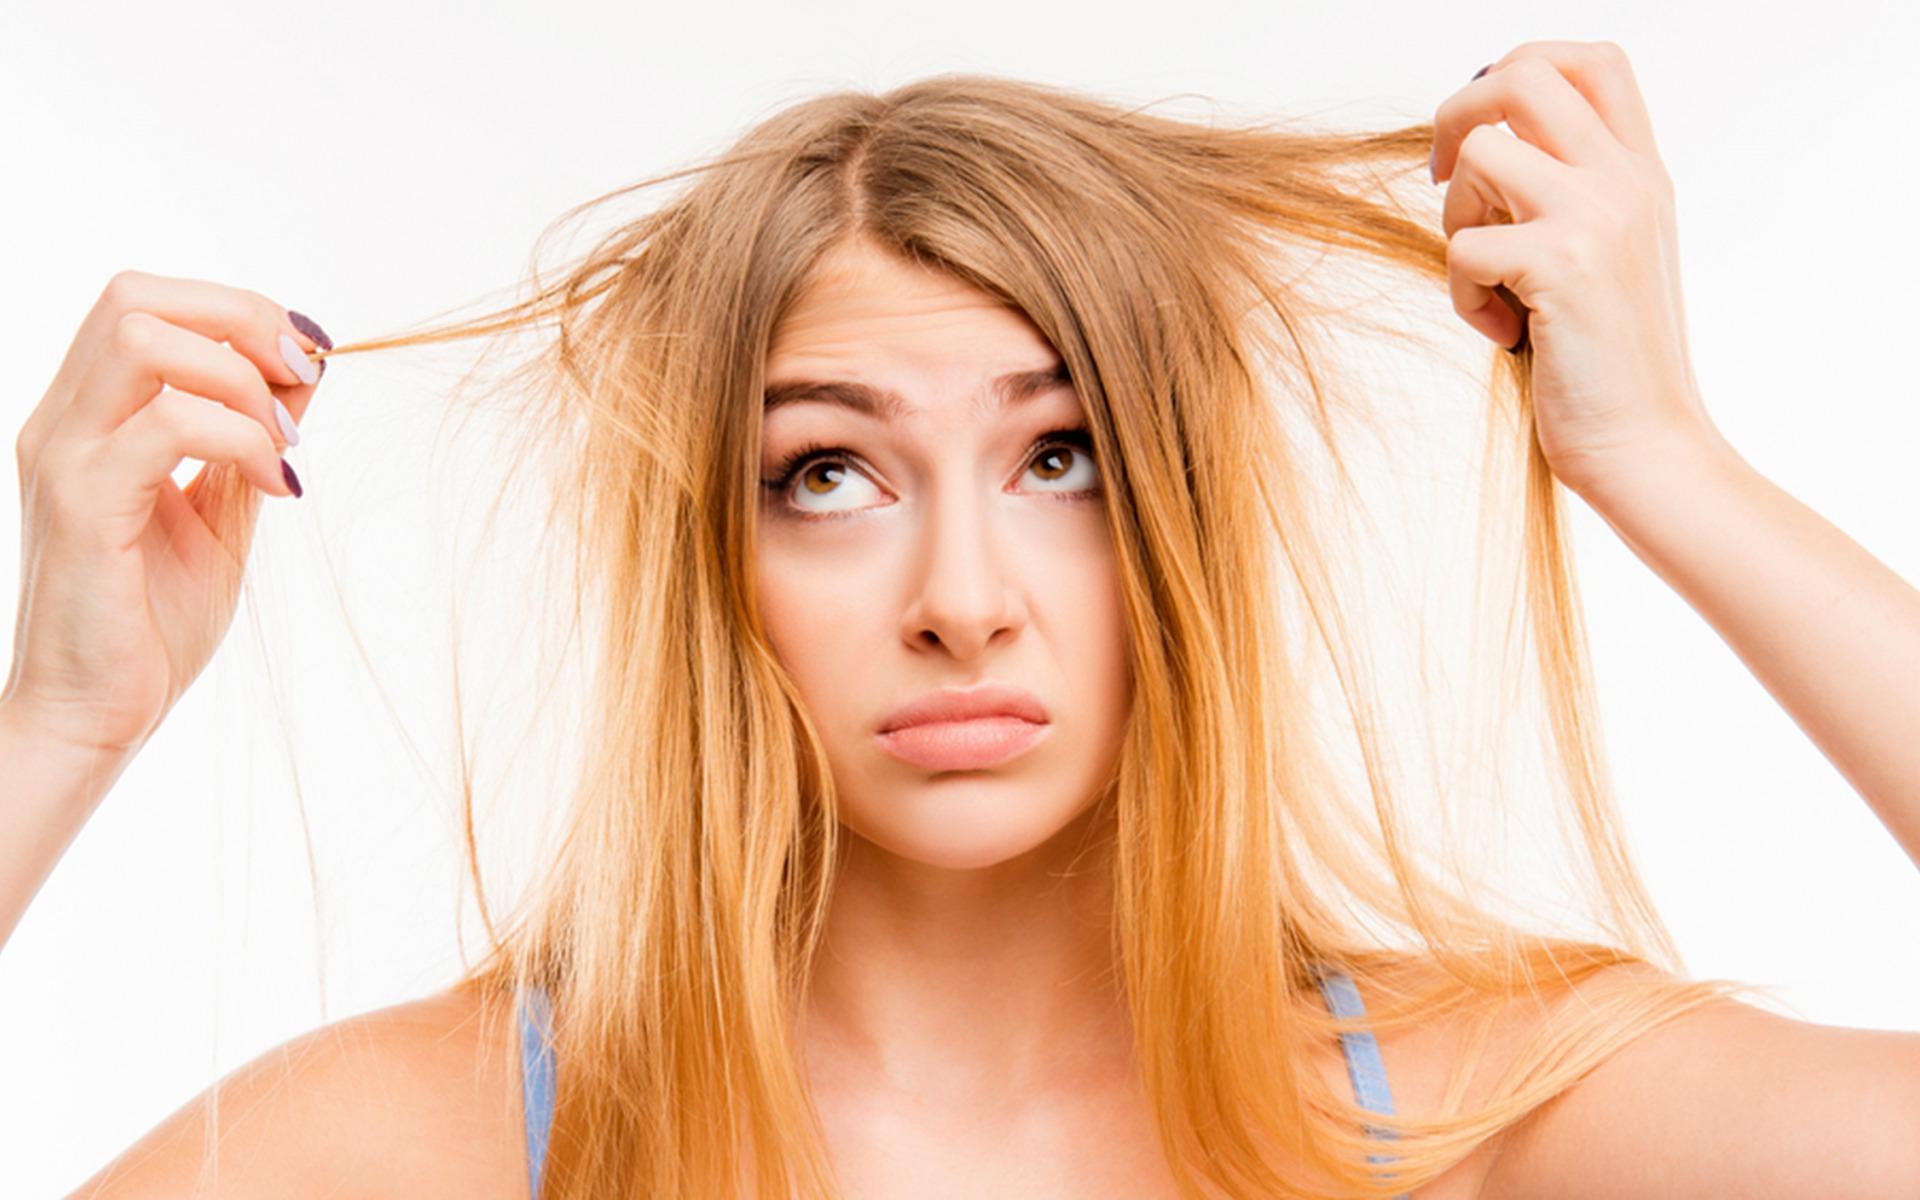 concern-annoyance-hair-hair